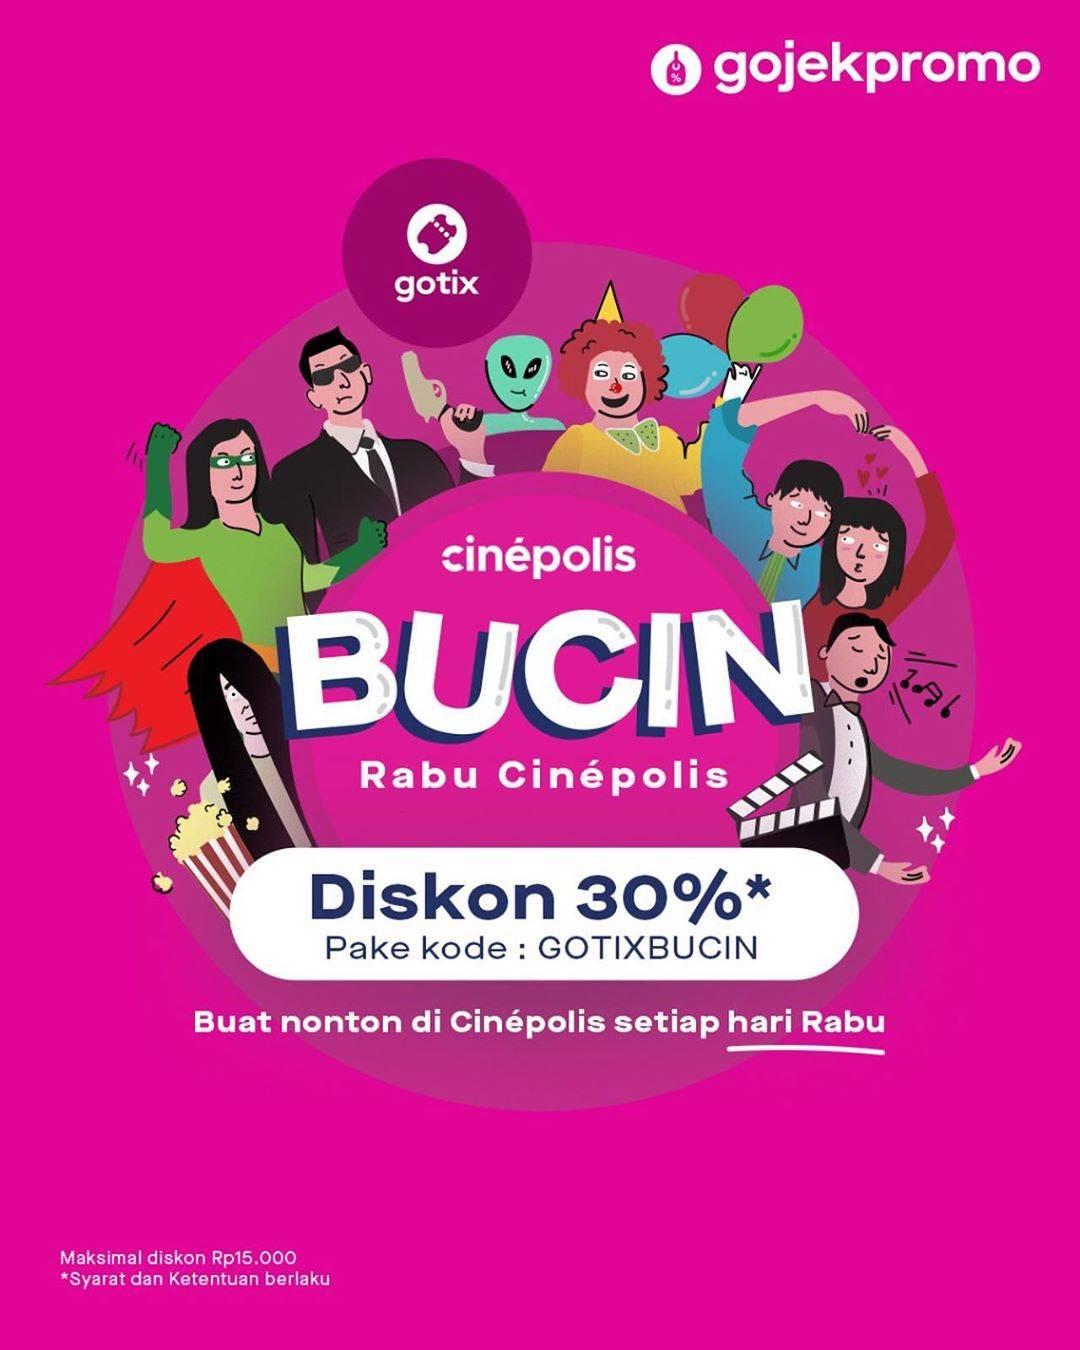 Gotix Diskon 30% Buat Nonton Di Cinepolis